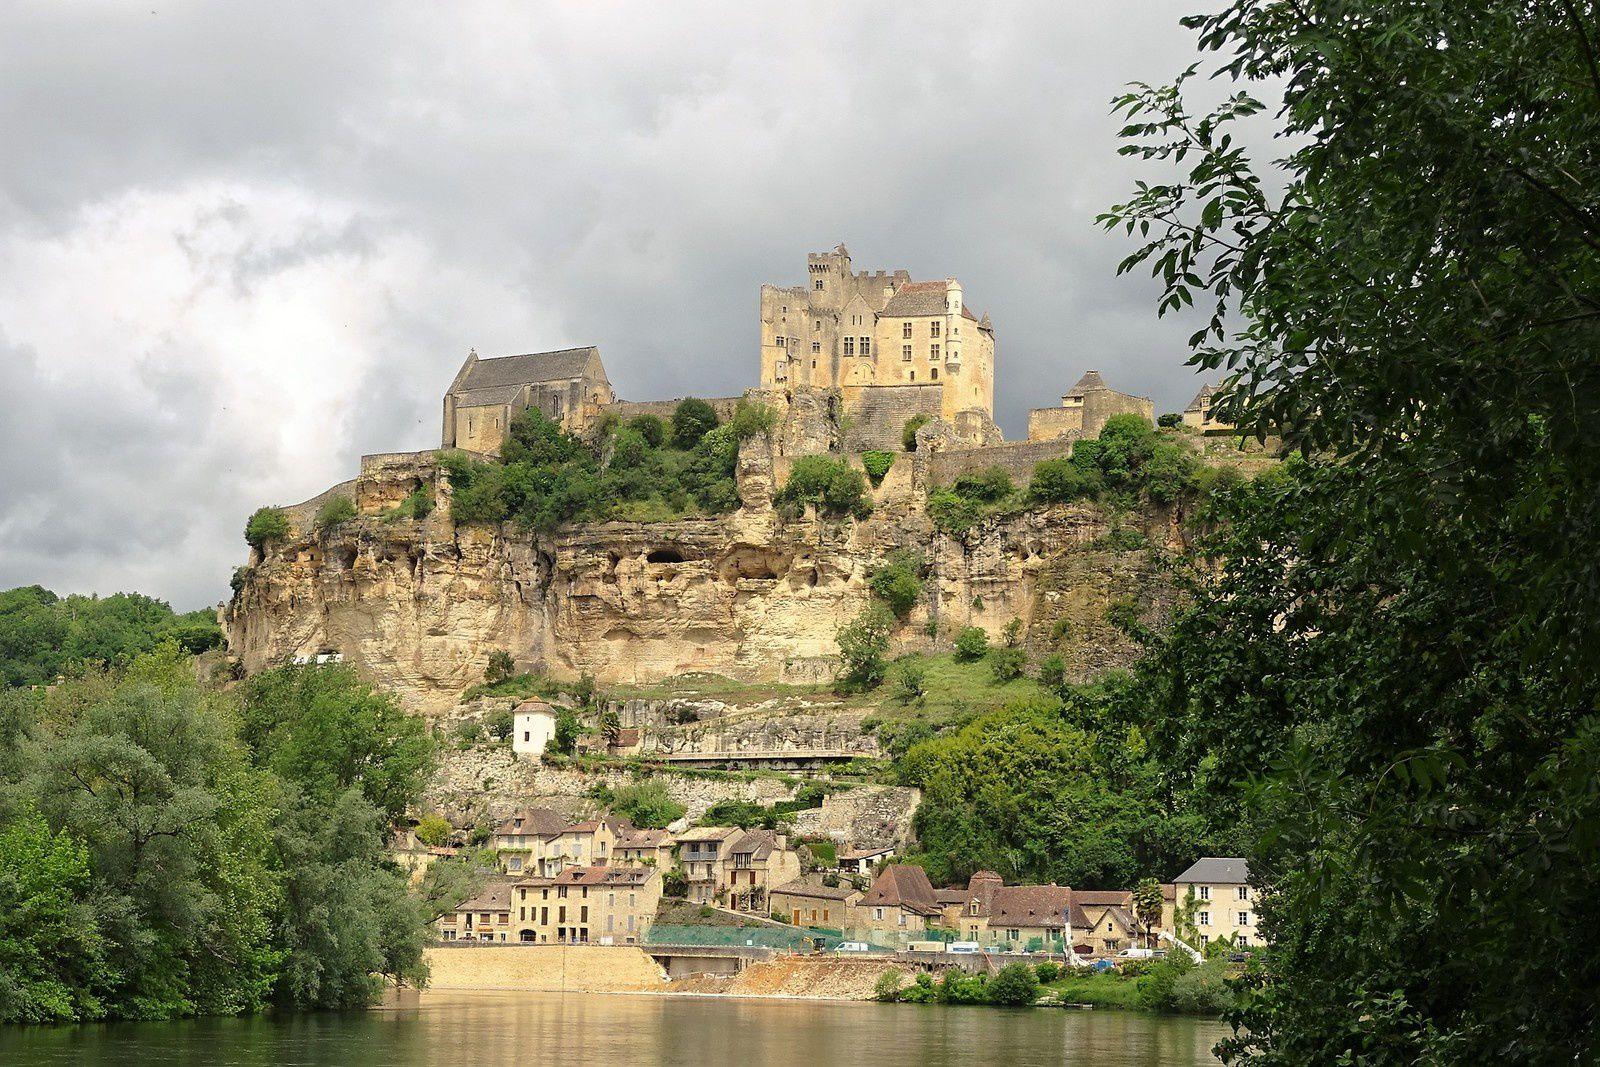 Le château de Beynac.